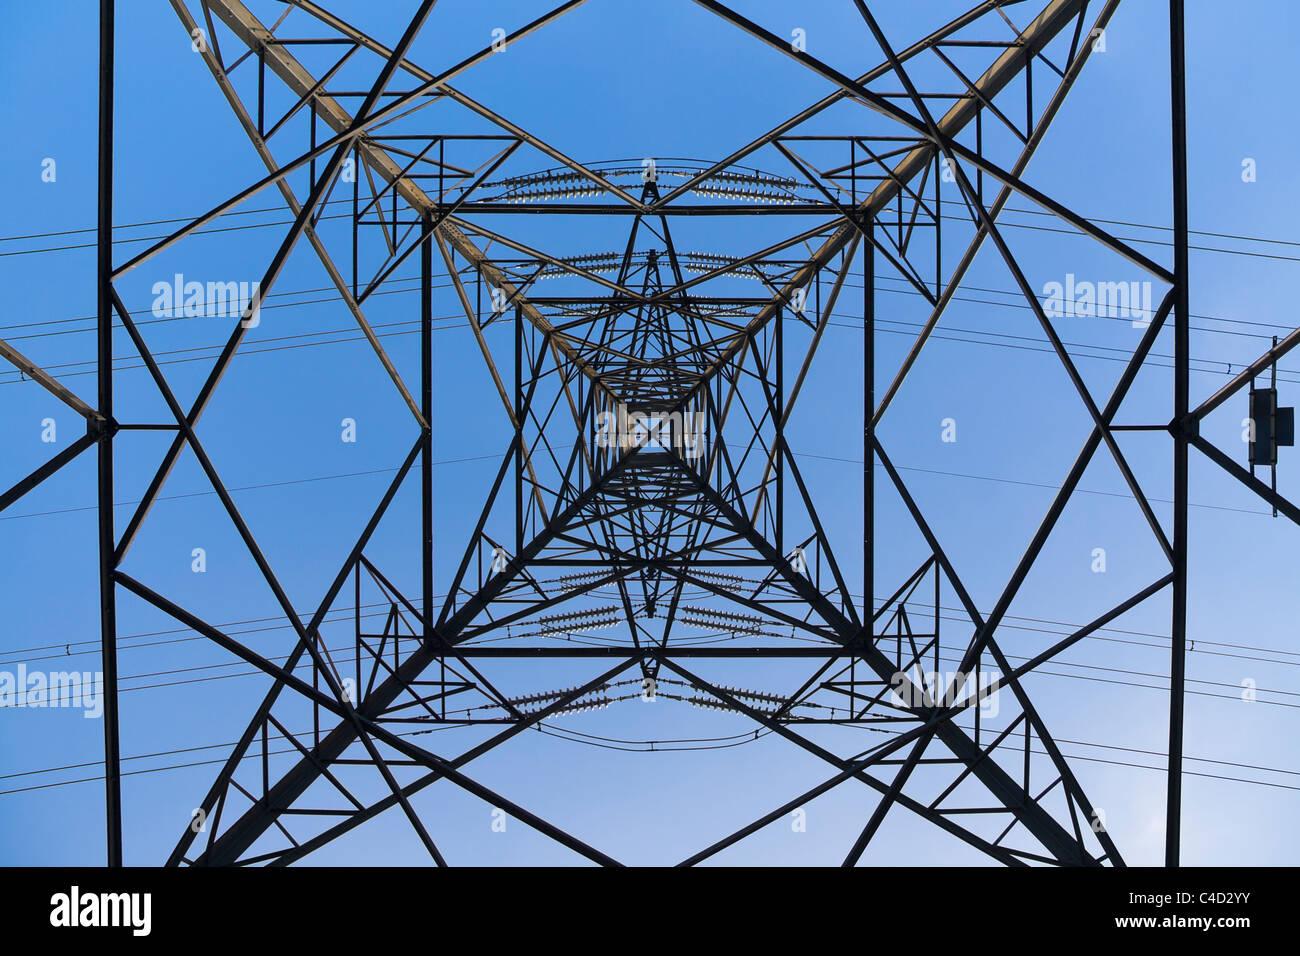 Electricity pylon or tower, UK - Stock Image